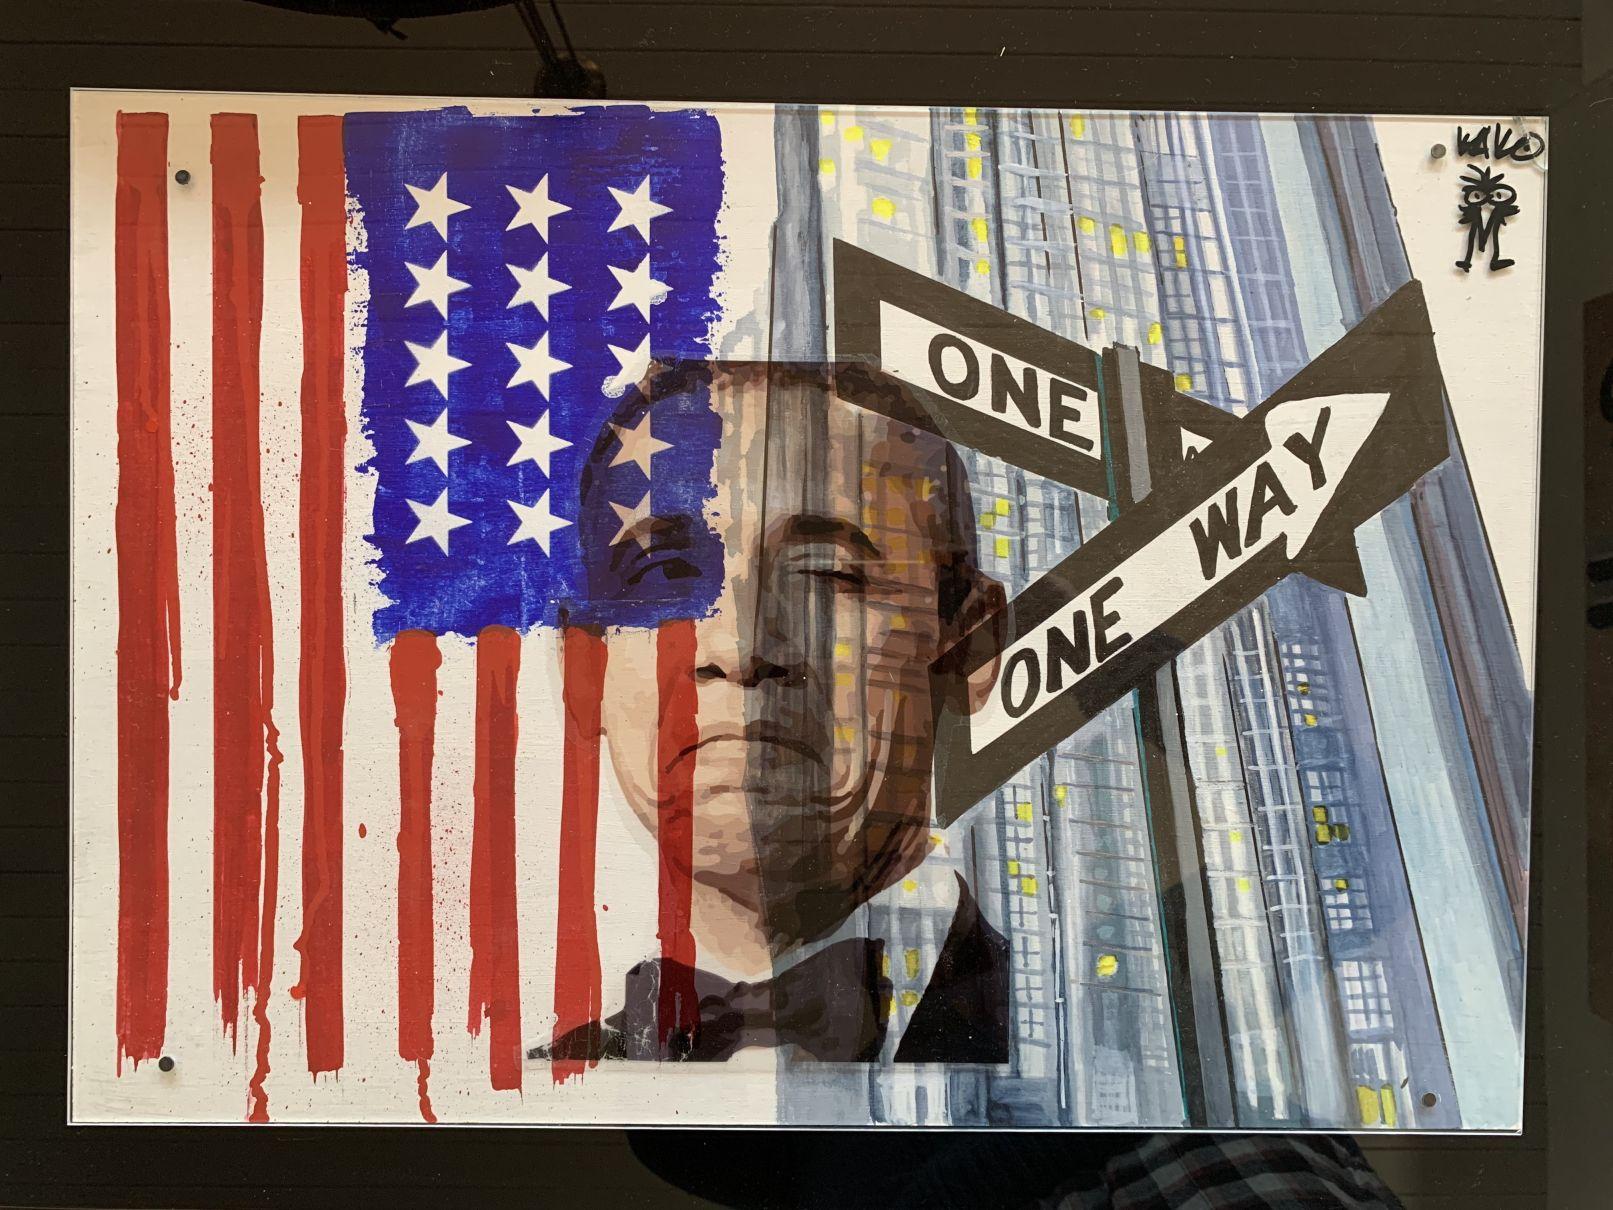 One way (2020) - Kako Street Art